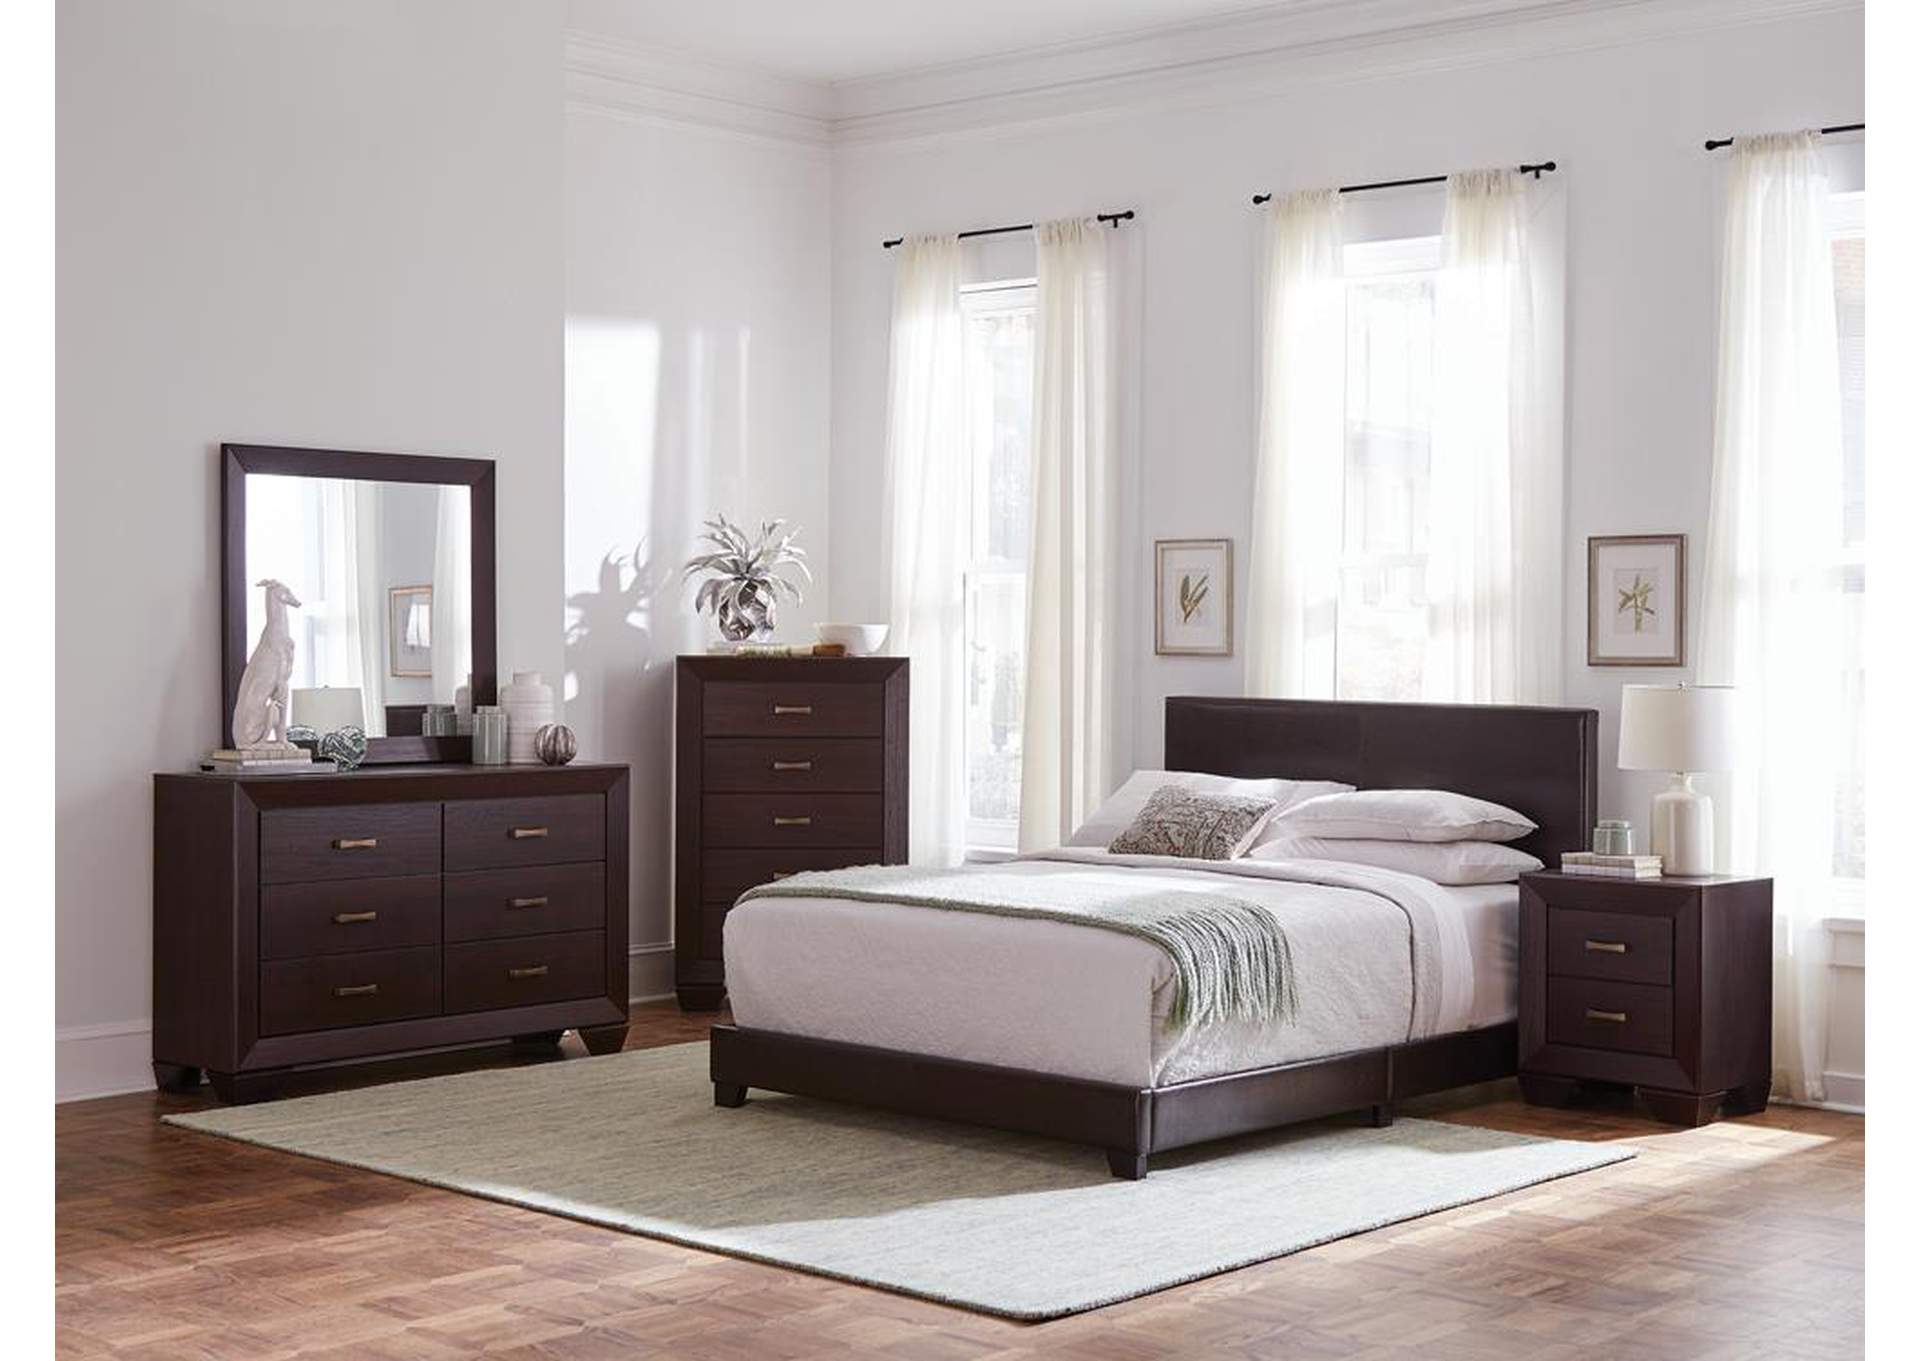 Pink Swan 5 Piece California King Bedroom Set Sam S Furniture And Mattress